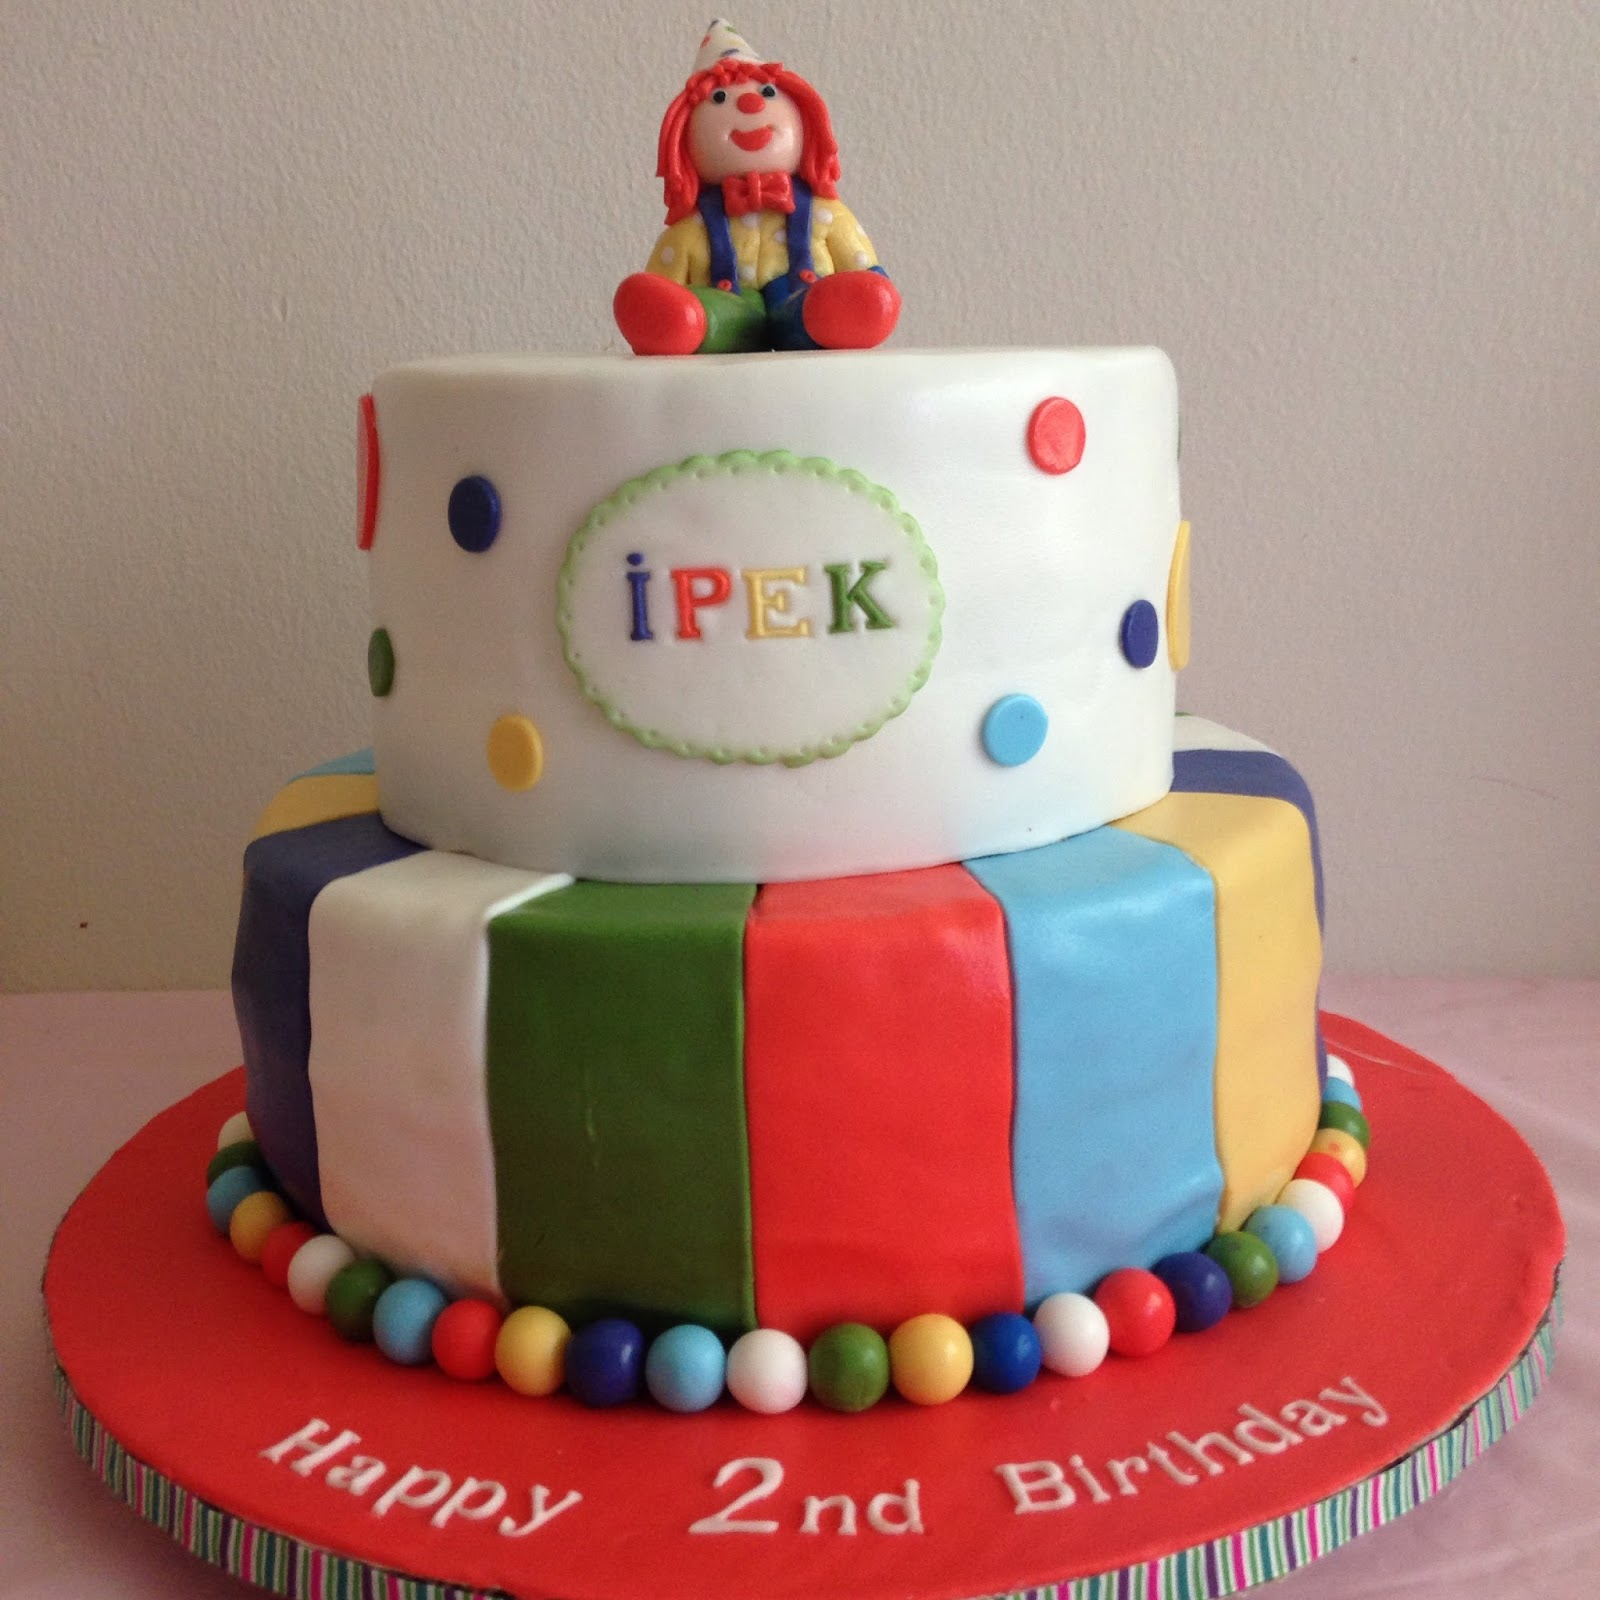 Mario Bros Themed Cake Super Mario Bros Birthday Cake Fun Sugar